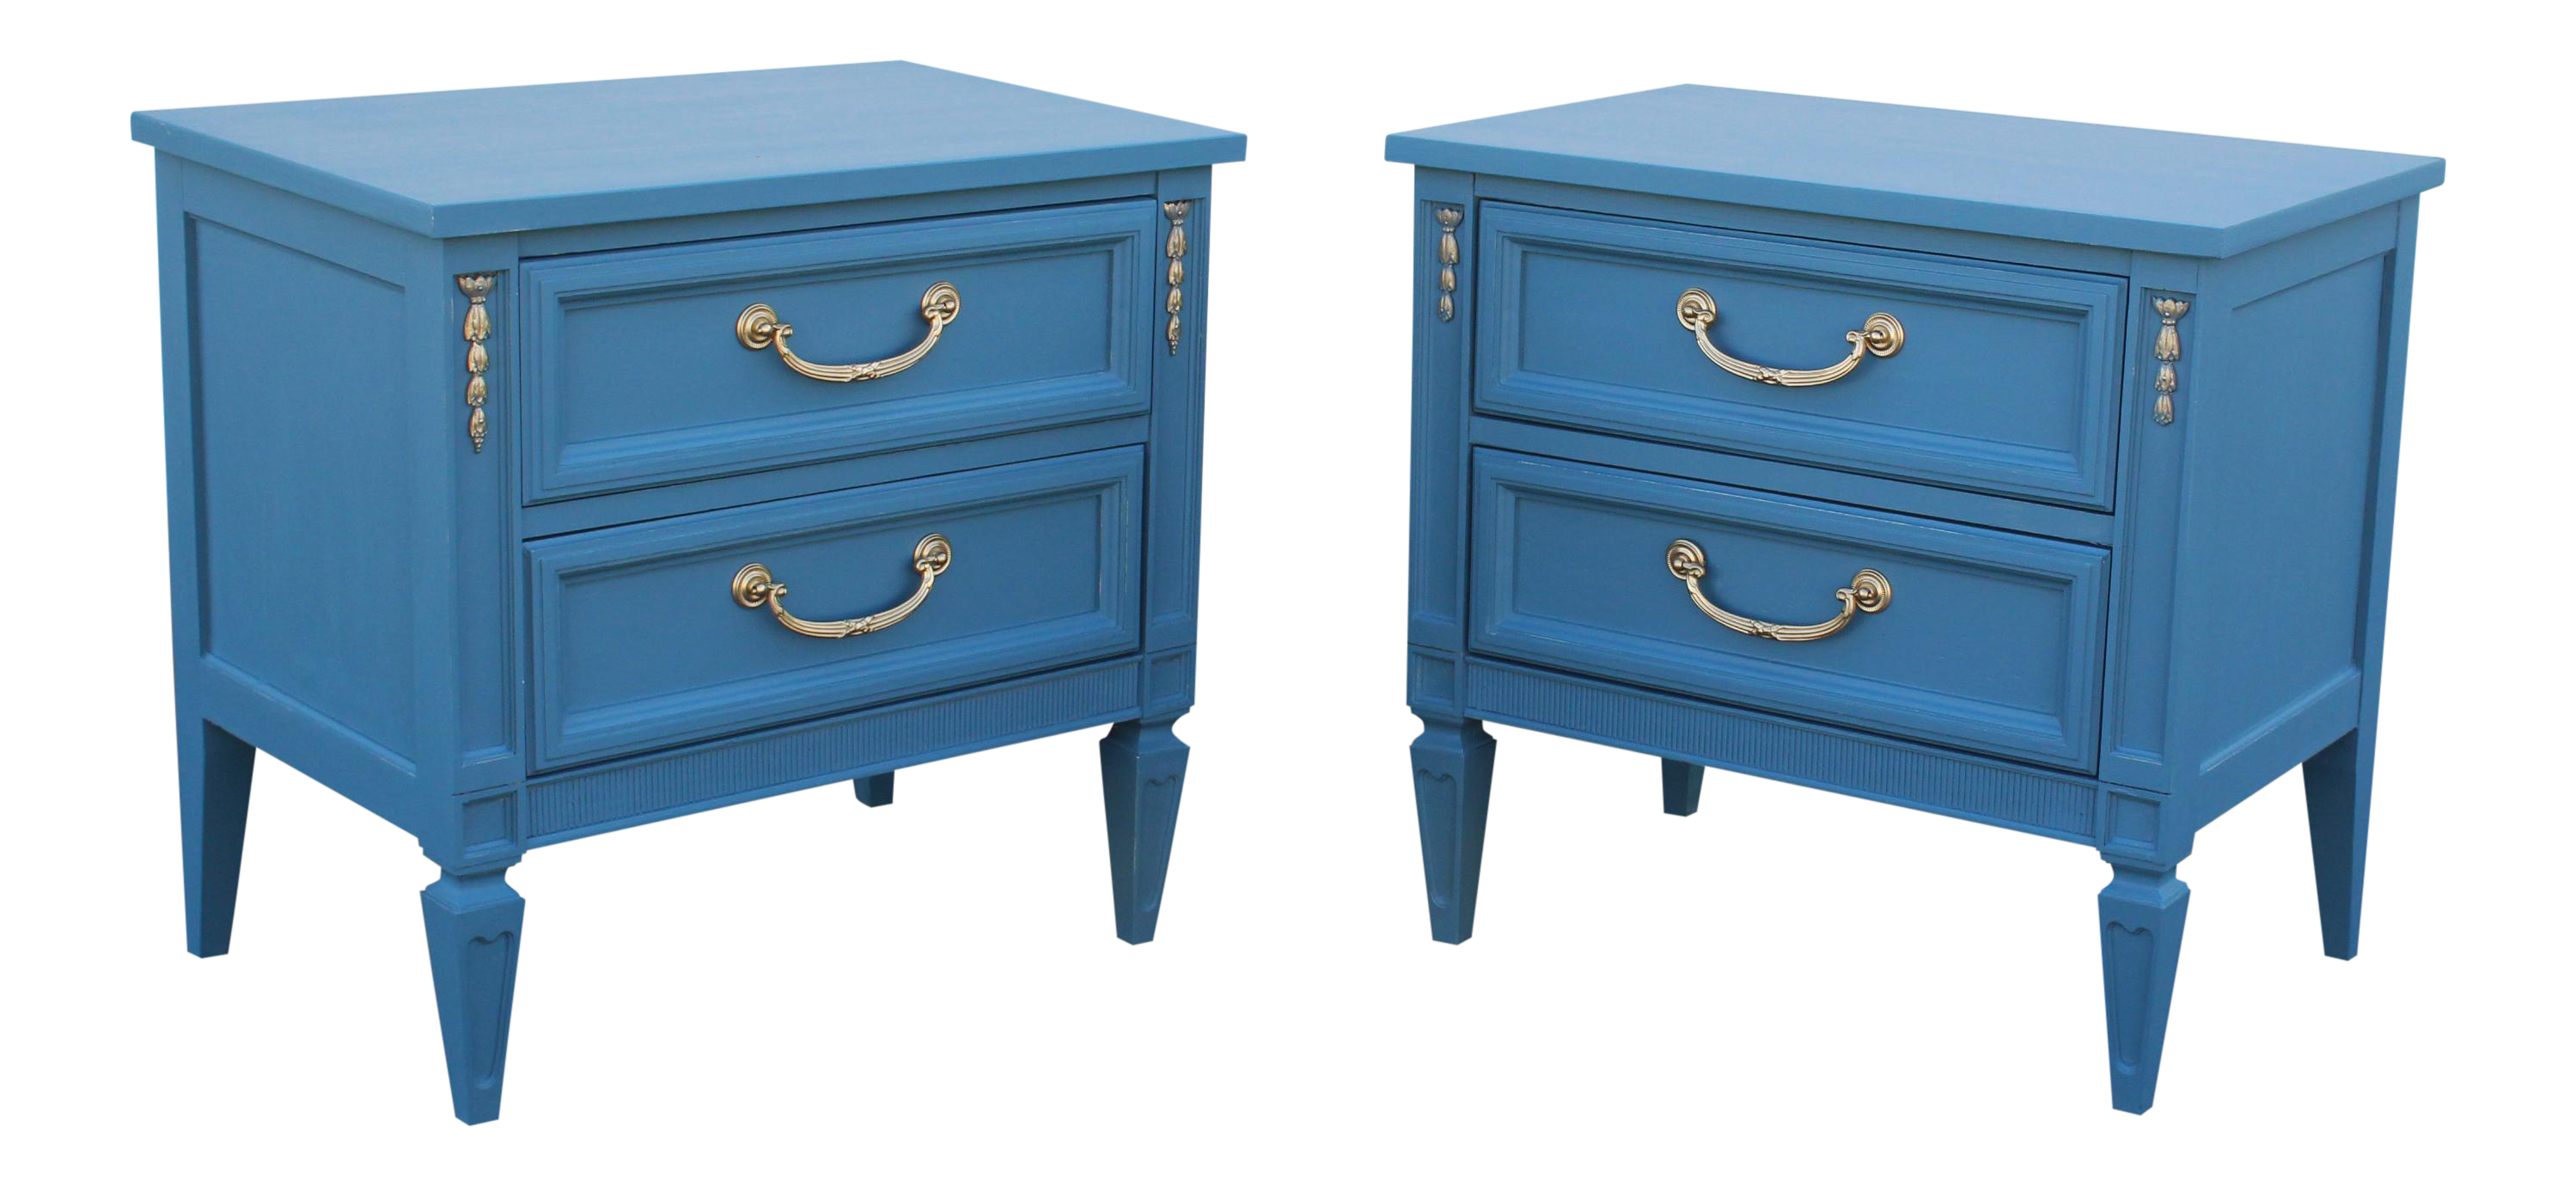 pair of mid century style blue nightstands mid century nightstands